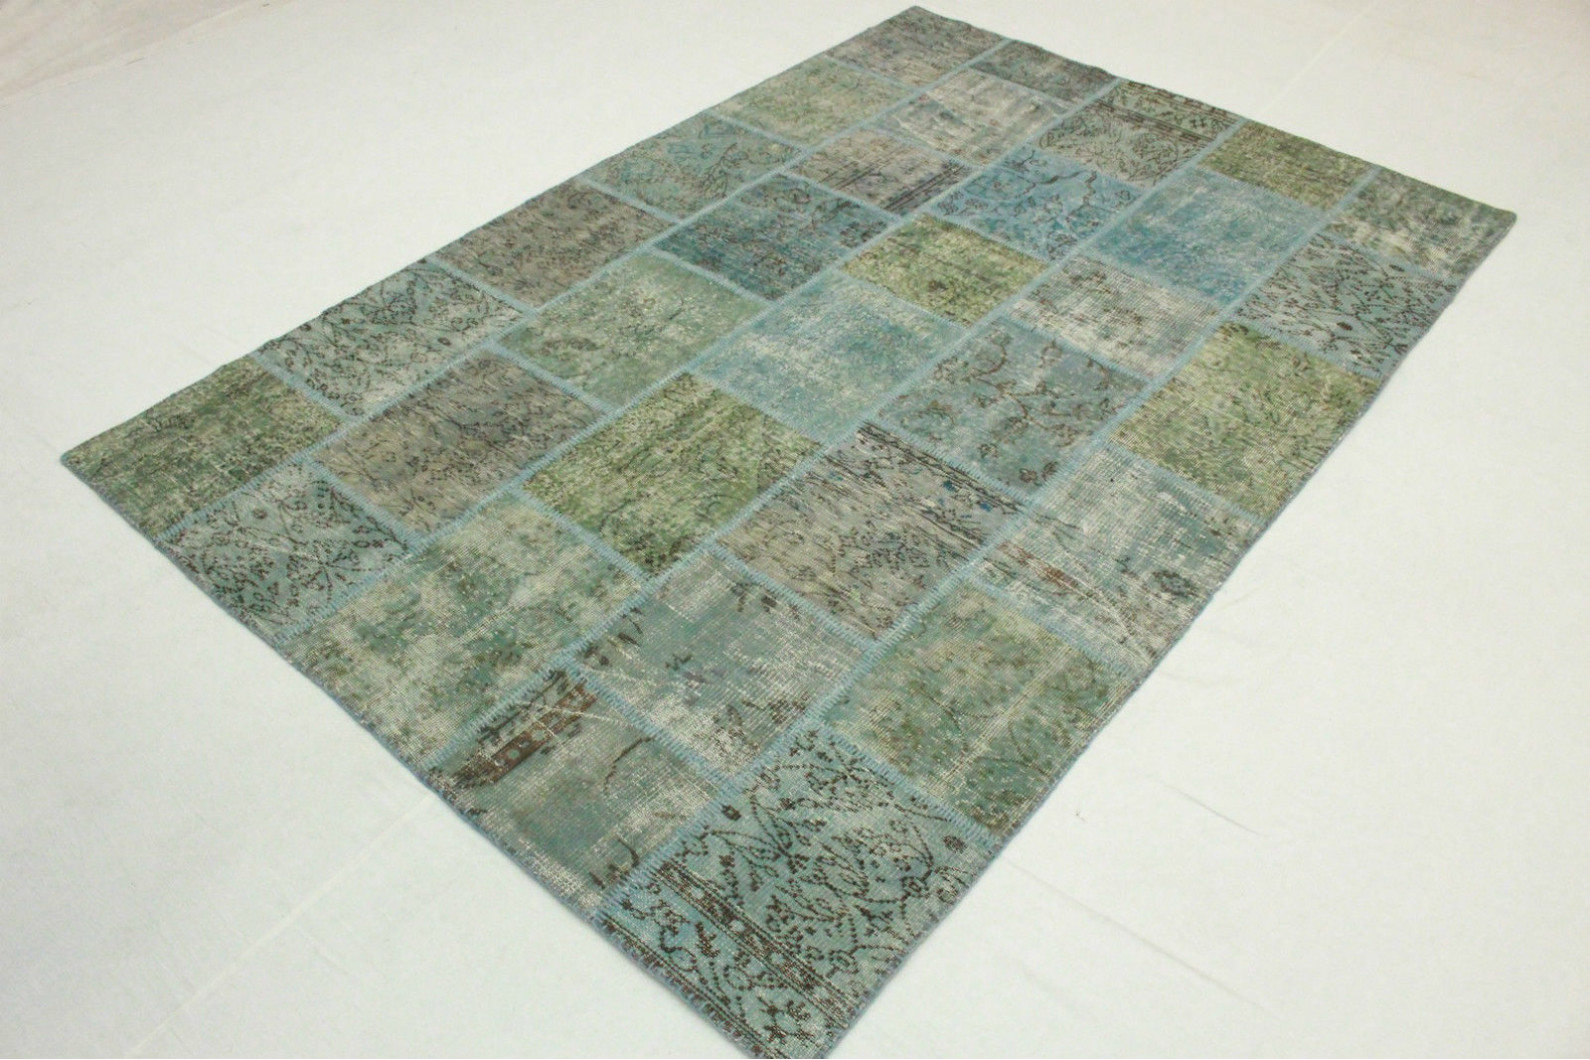 patchwork teppich gr n t rkis in 300x200cm 1011 7279 bei kaufen. Black Bedroom Furniture Sets. Home Design Ideas